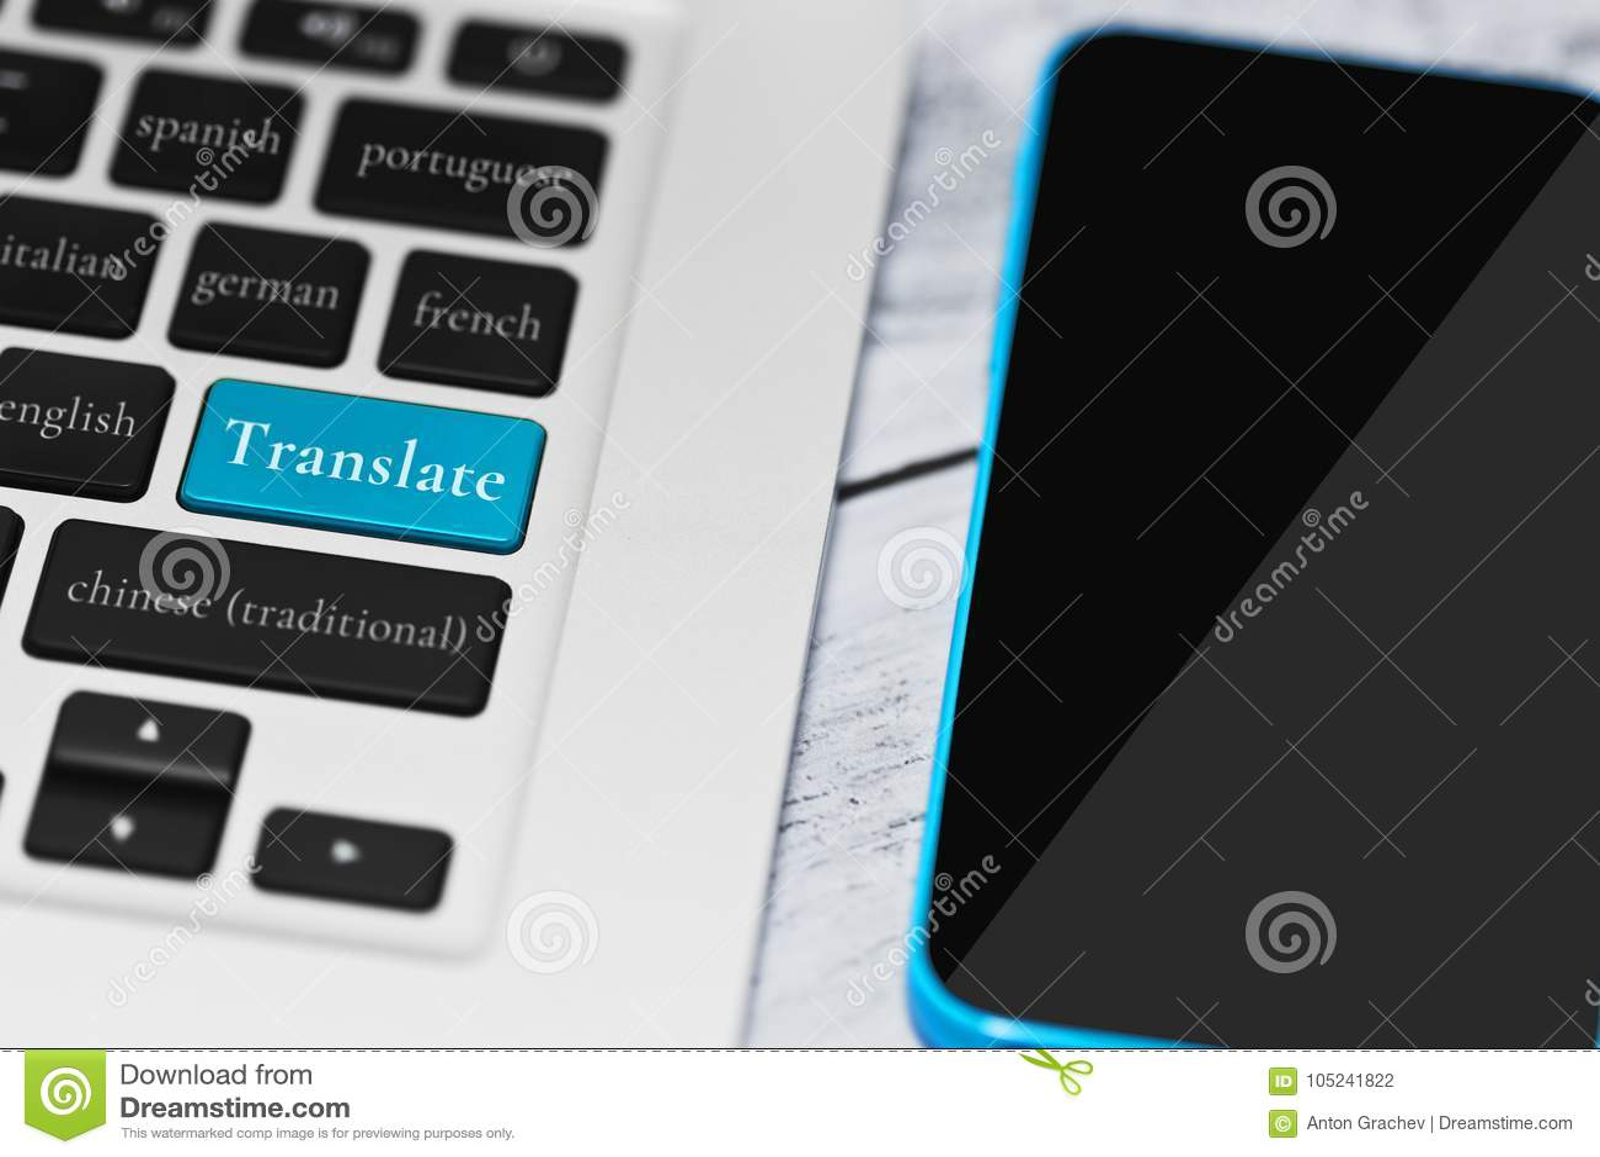 online translation via computer service concept stock photo image